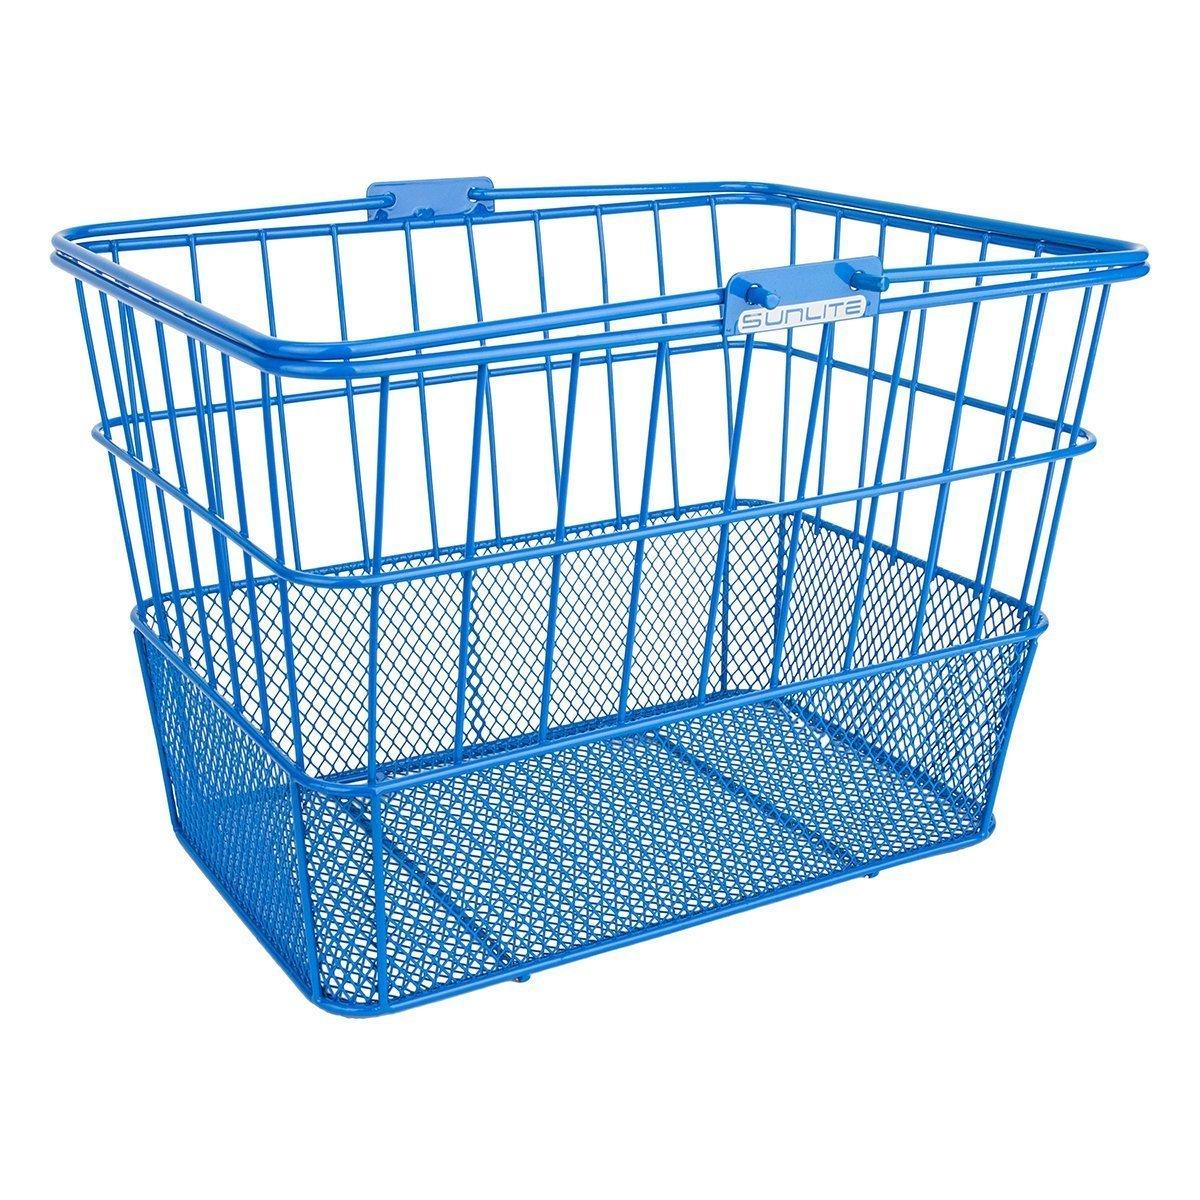 Sunlite Standard Mesh Bottom Lift off Basket with Bracket, Blue